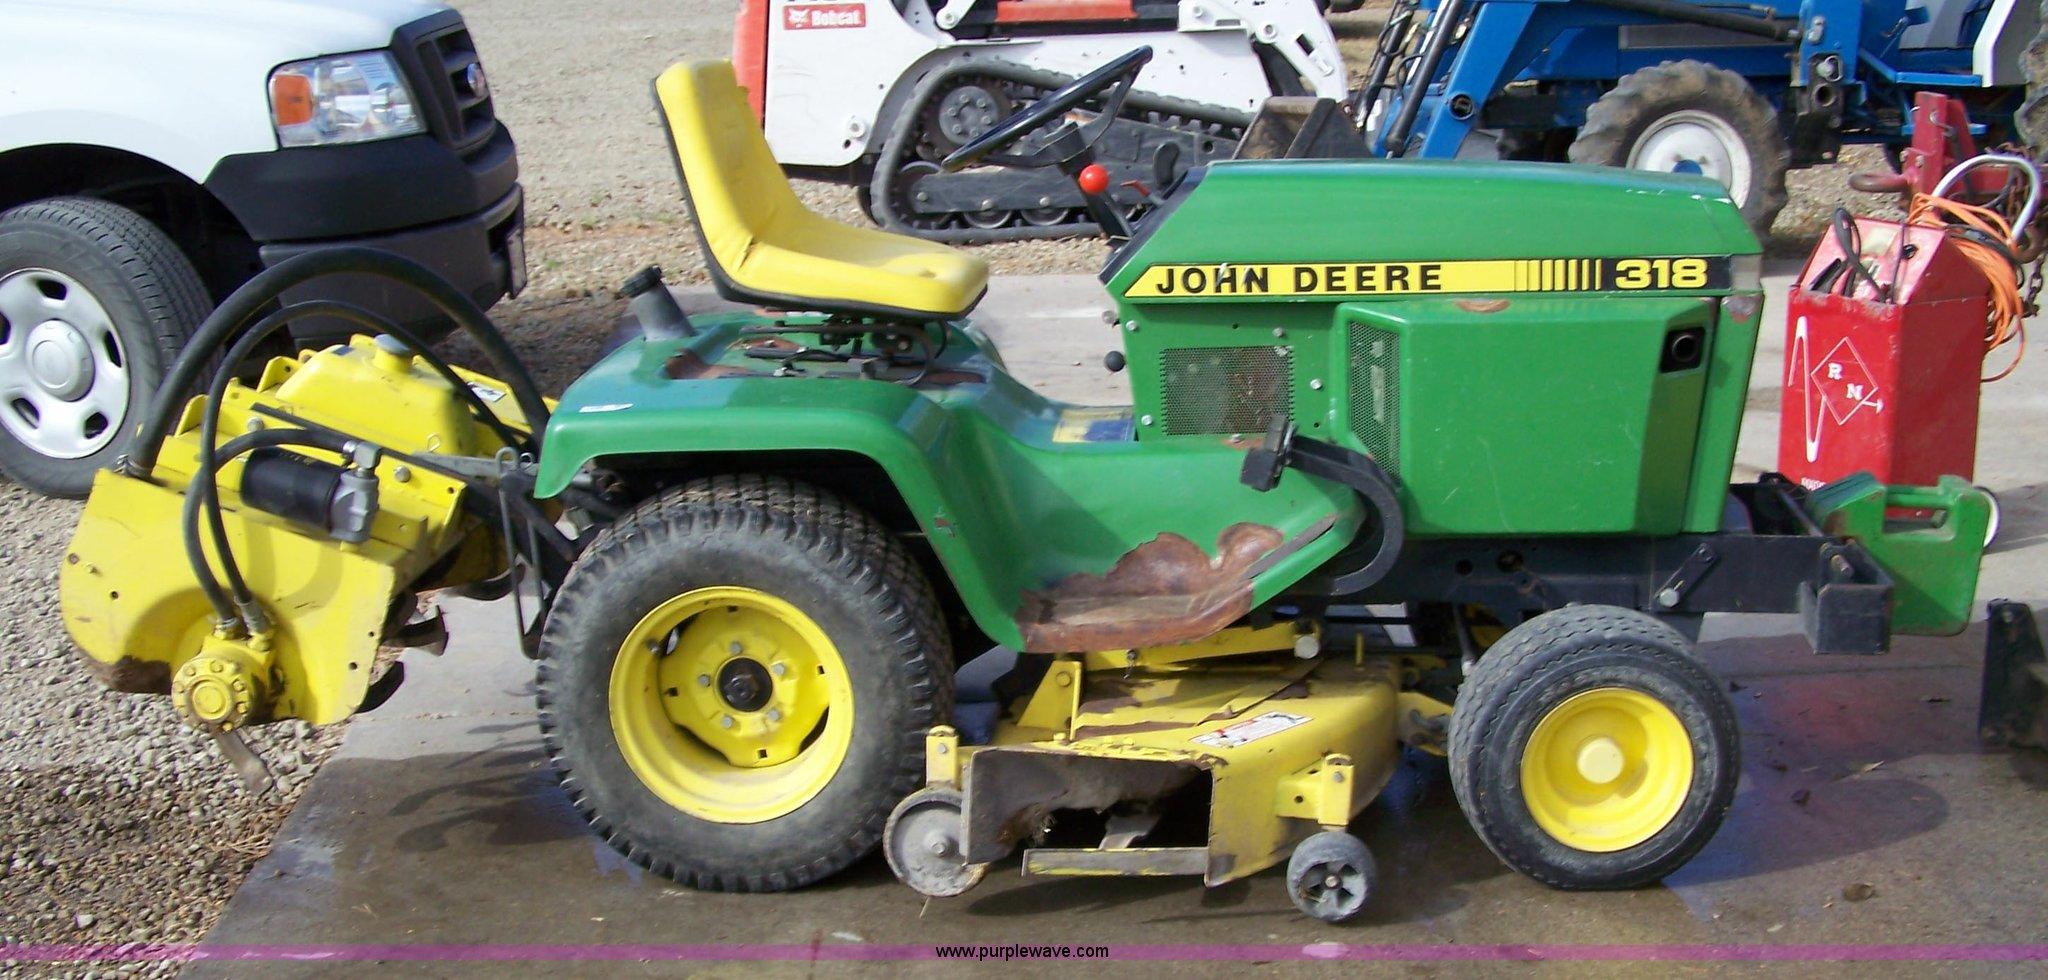 John Deere 318 >> 1988 John Deere 318 Lawn Tractor Item 7296 Sold Novembe